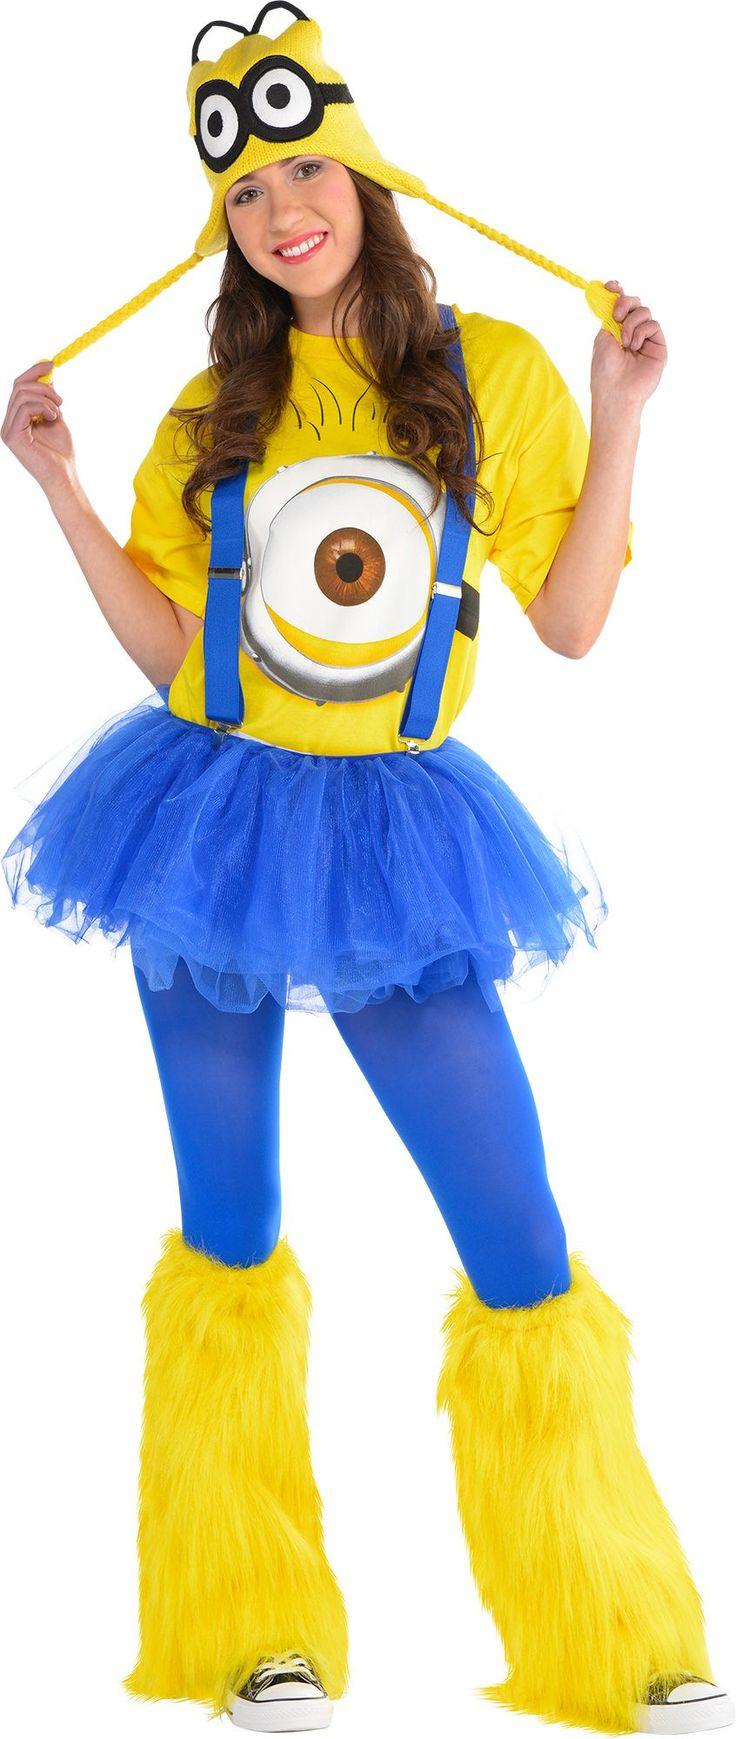 Make Your Costume - Womens Minion #3